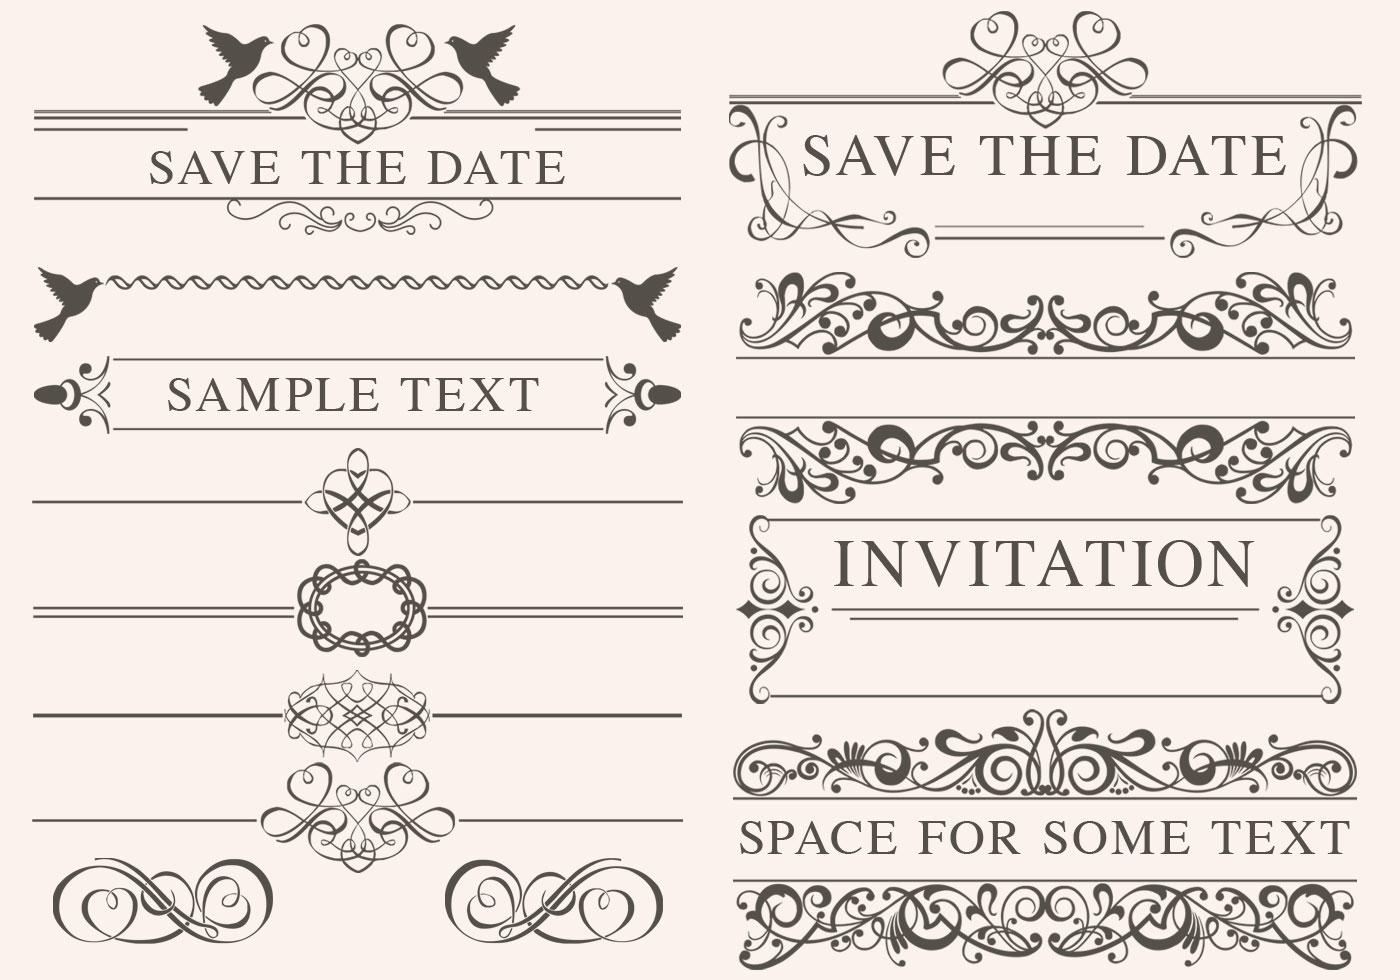 Vintage wedding ornament vectors download free vector art stock vintage wedding ornament vectors download free vector art stock graphics images junglespirit Image collections